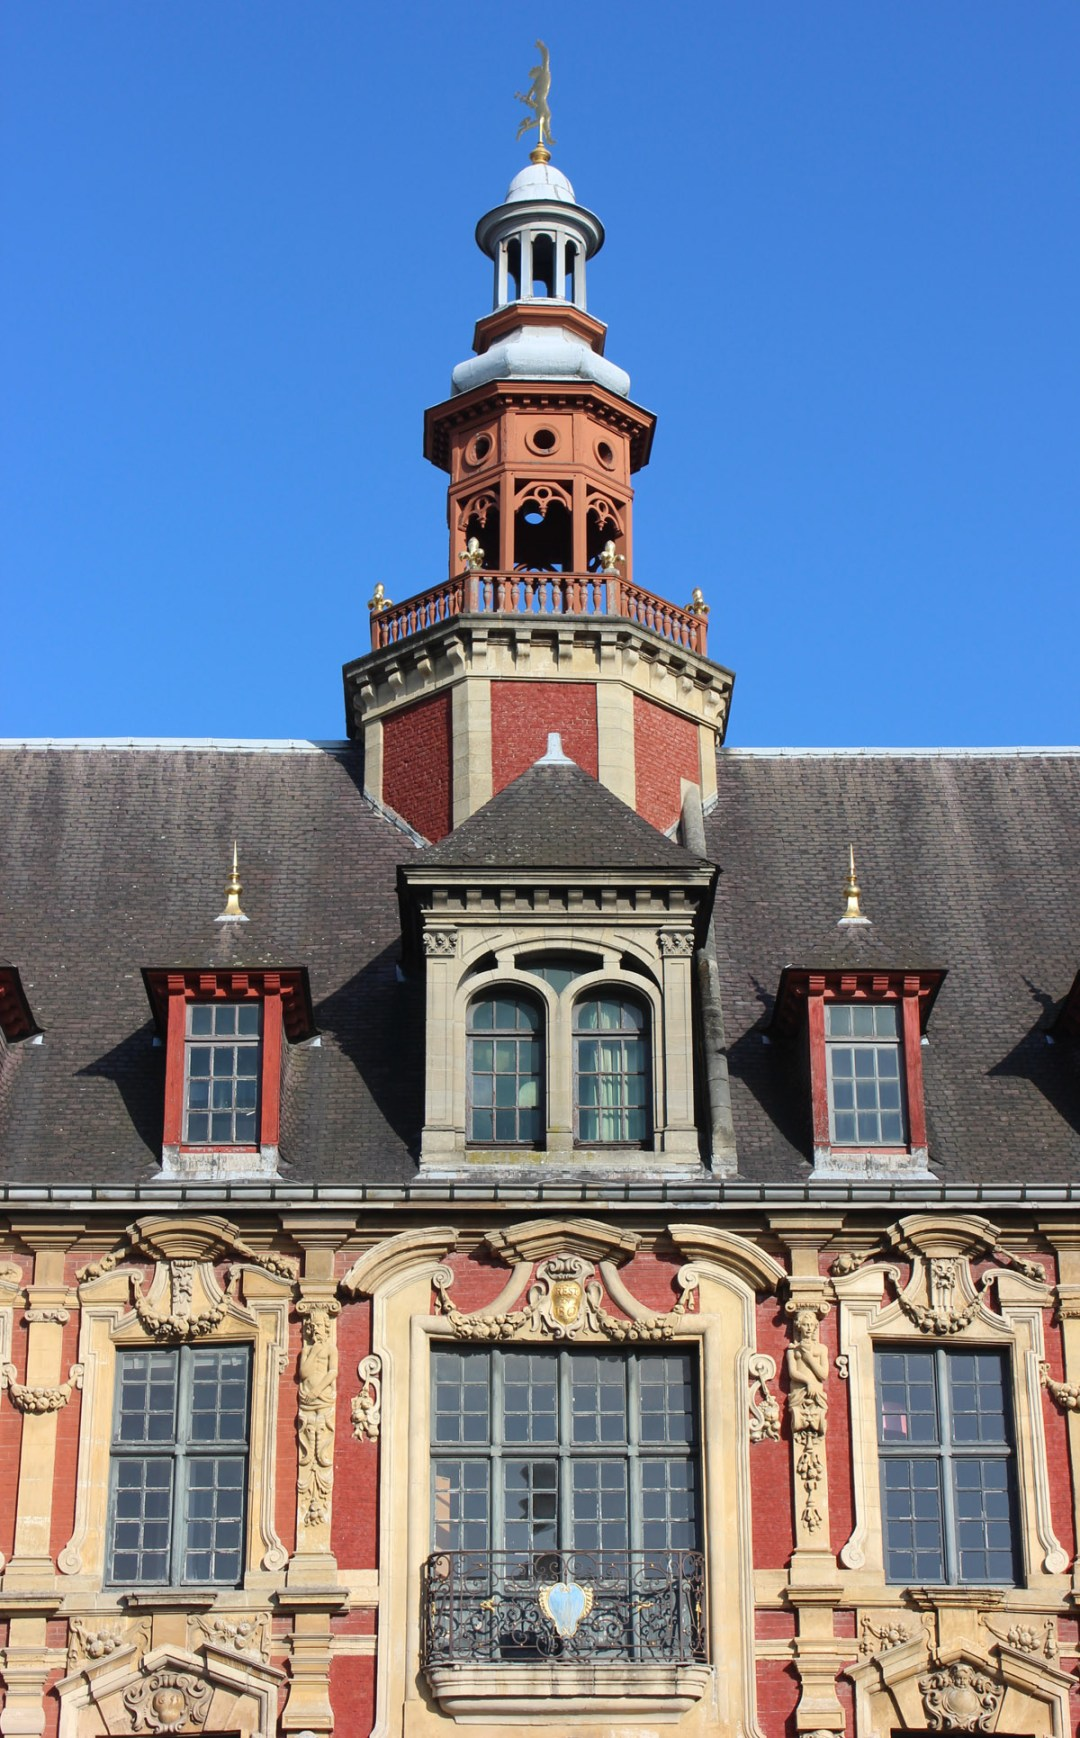 Lille-voyage-copyright-happynewgreen-176